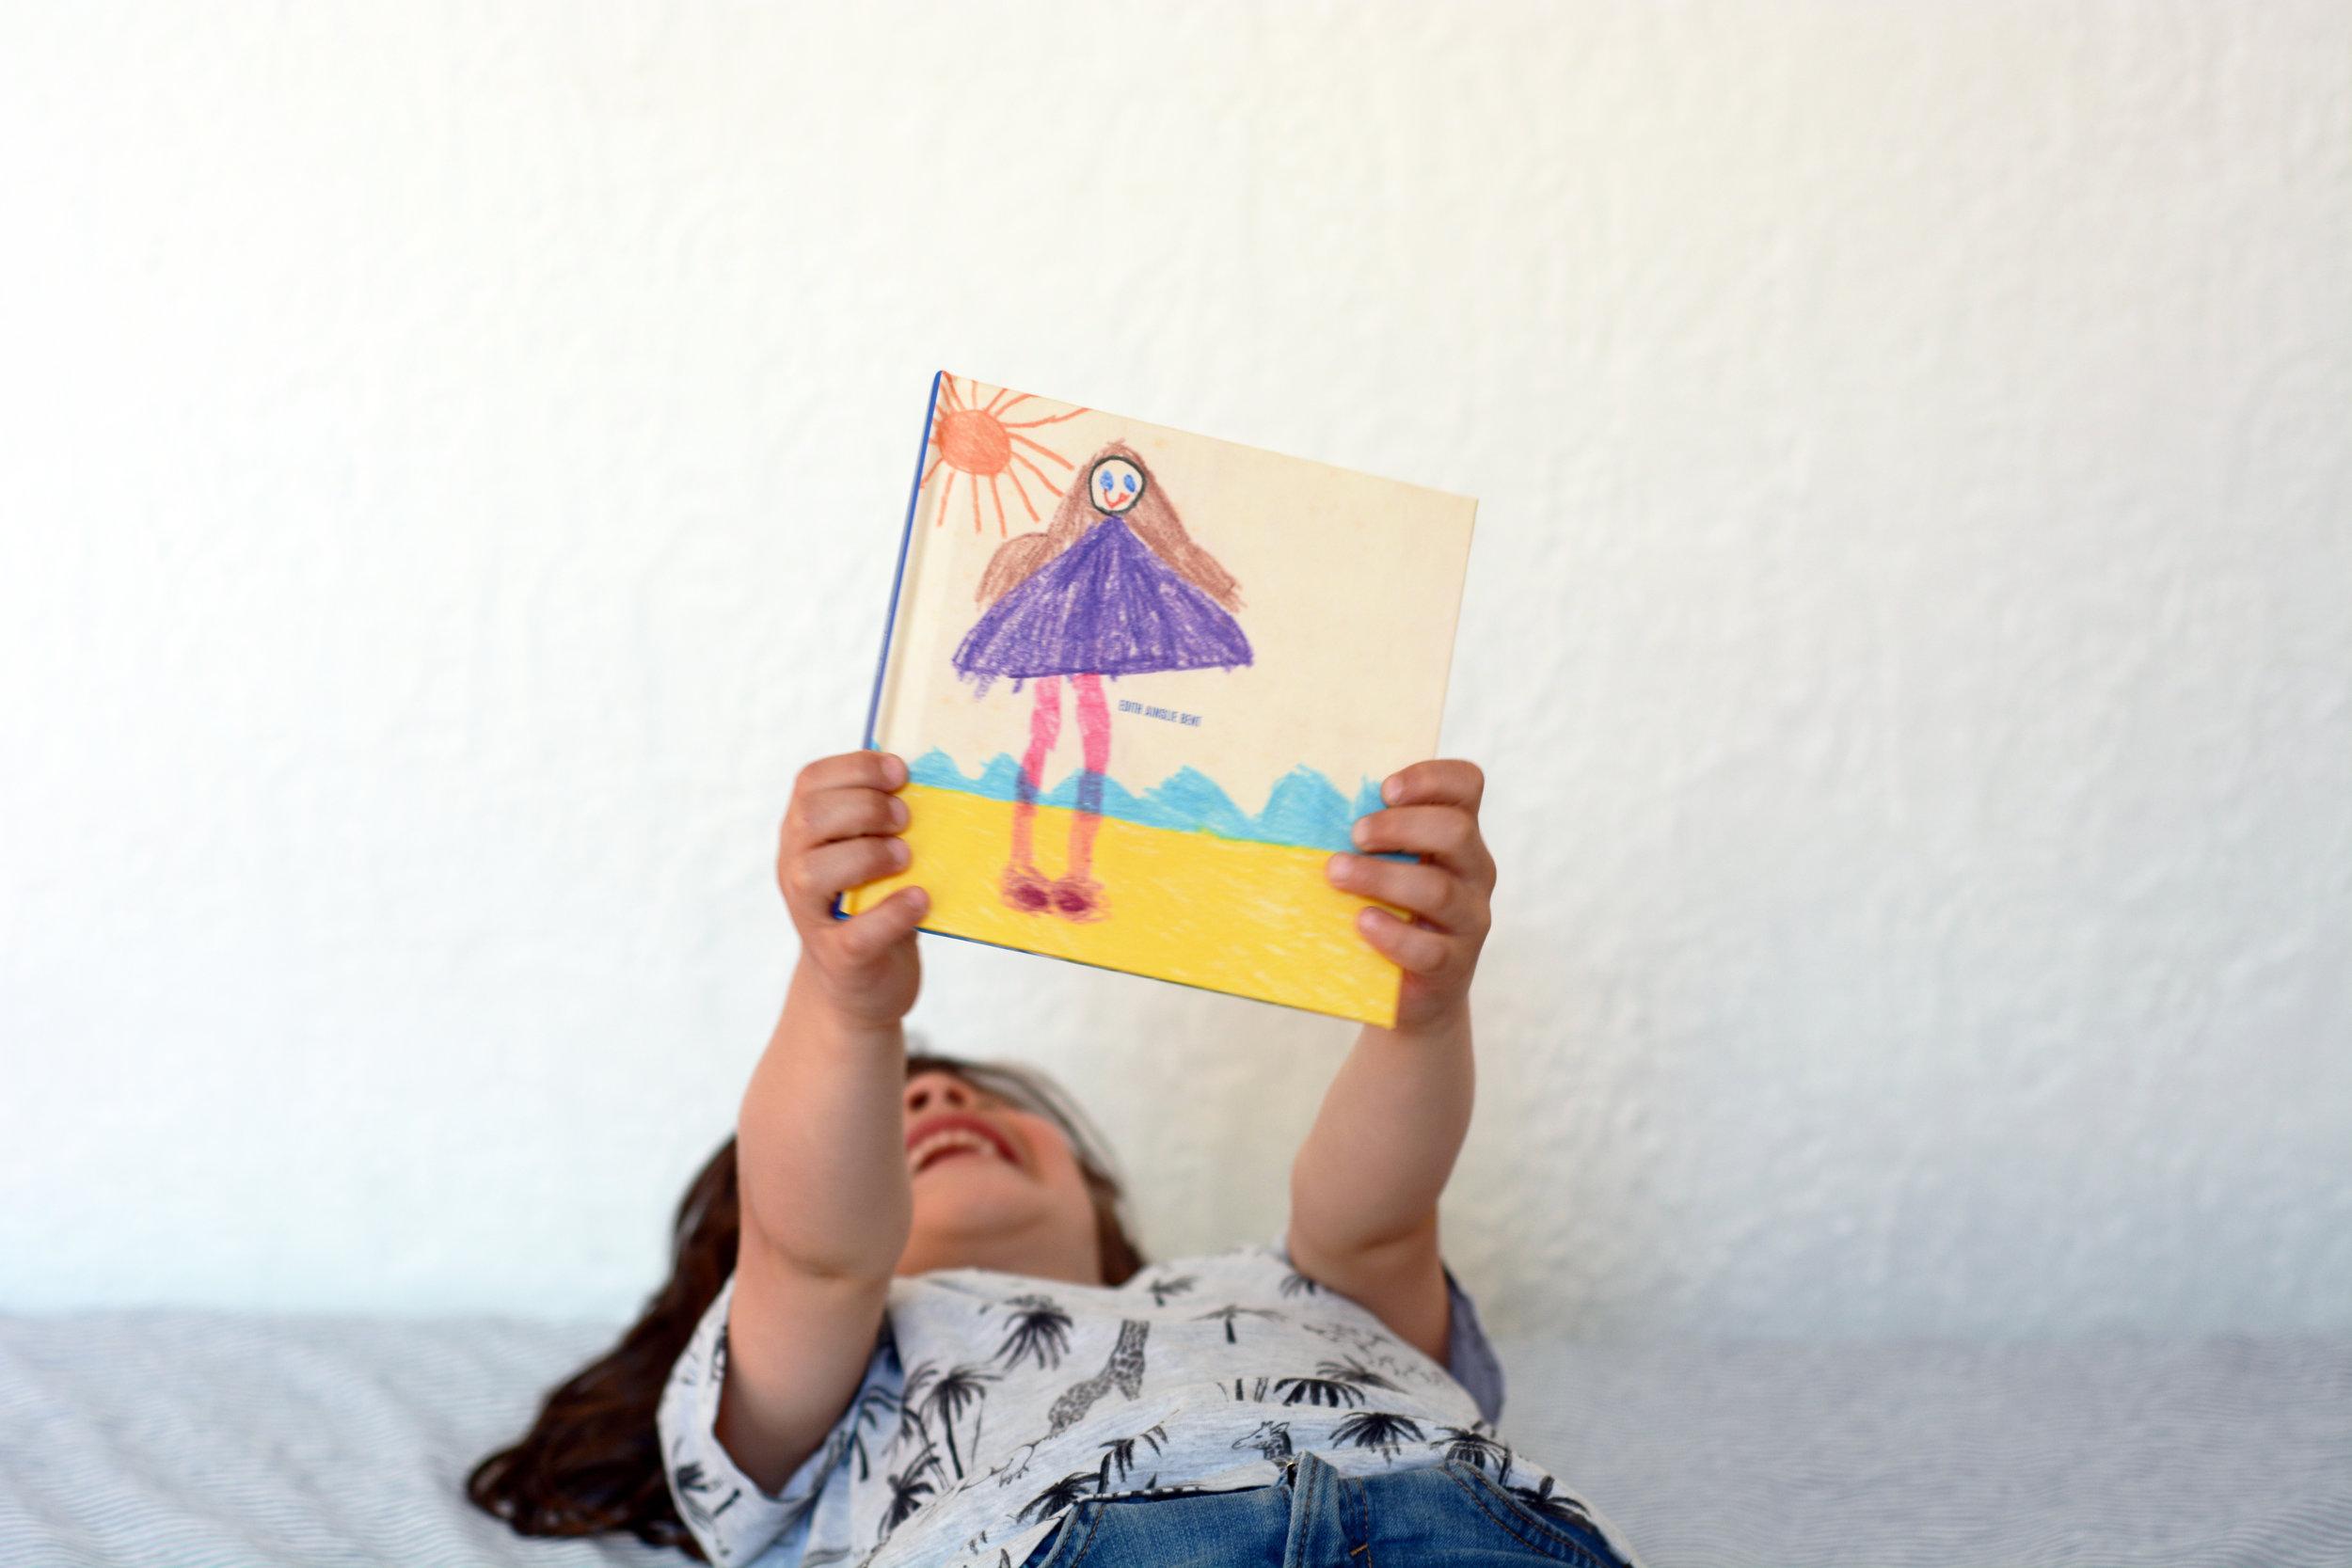 Transform your children's artwork into high-quality books